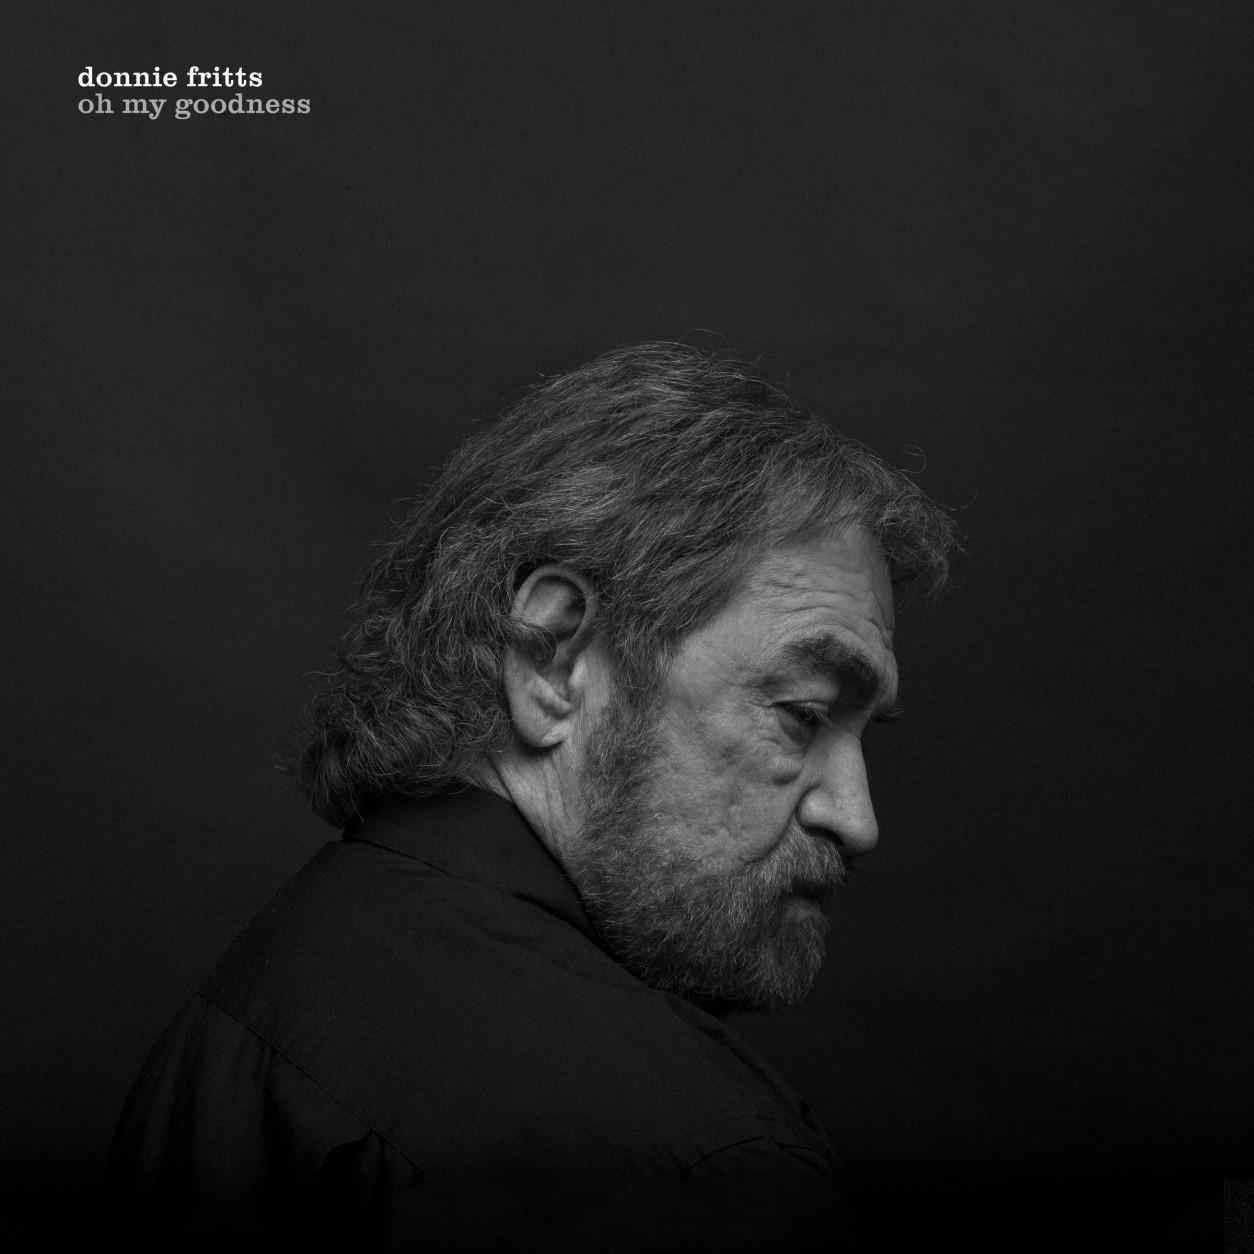 ¿Qué Estás Escuchando? - Página 21 Music-Review-Donnie-Fritts-1254x1254